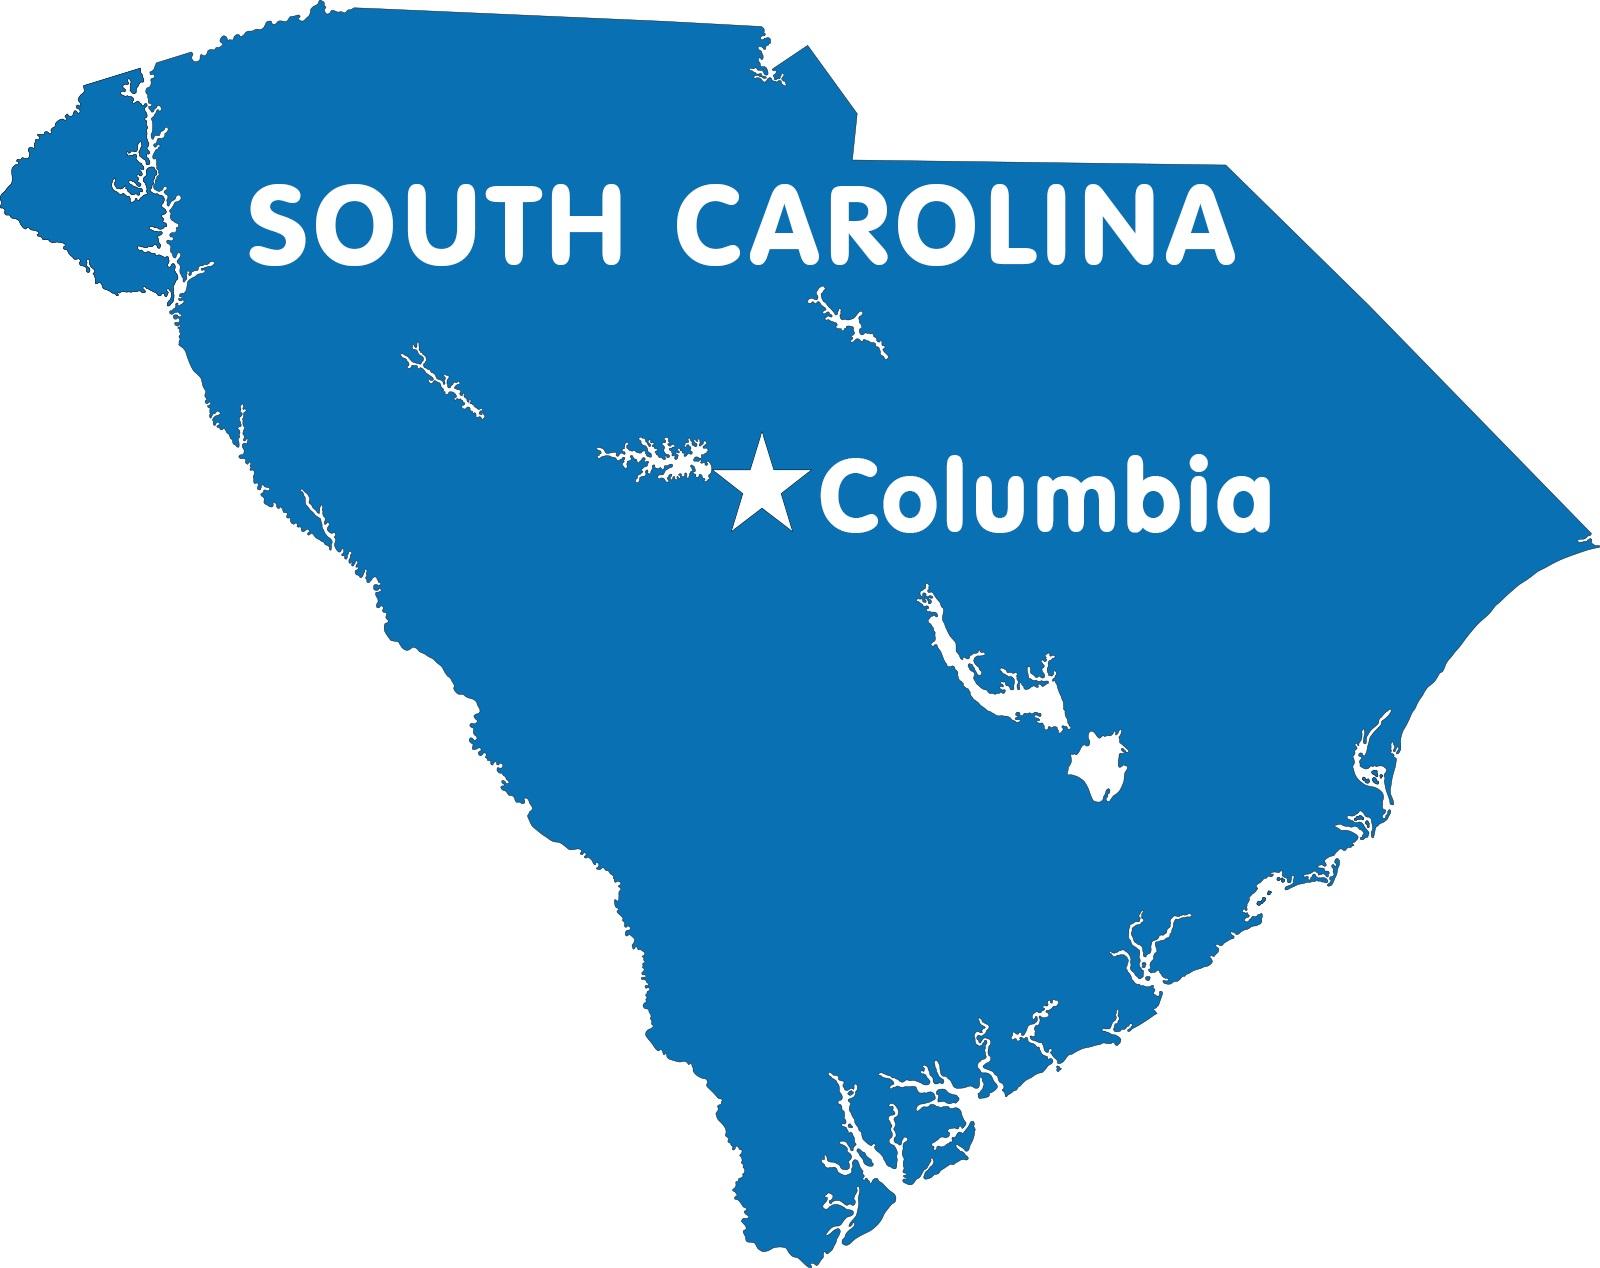 South Carolina Capital Map | Large Printable High Resolution and Standard Map